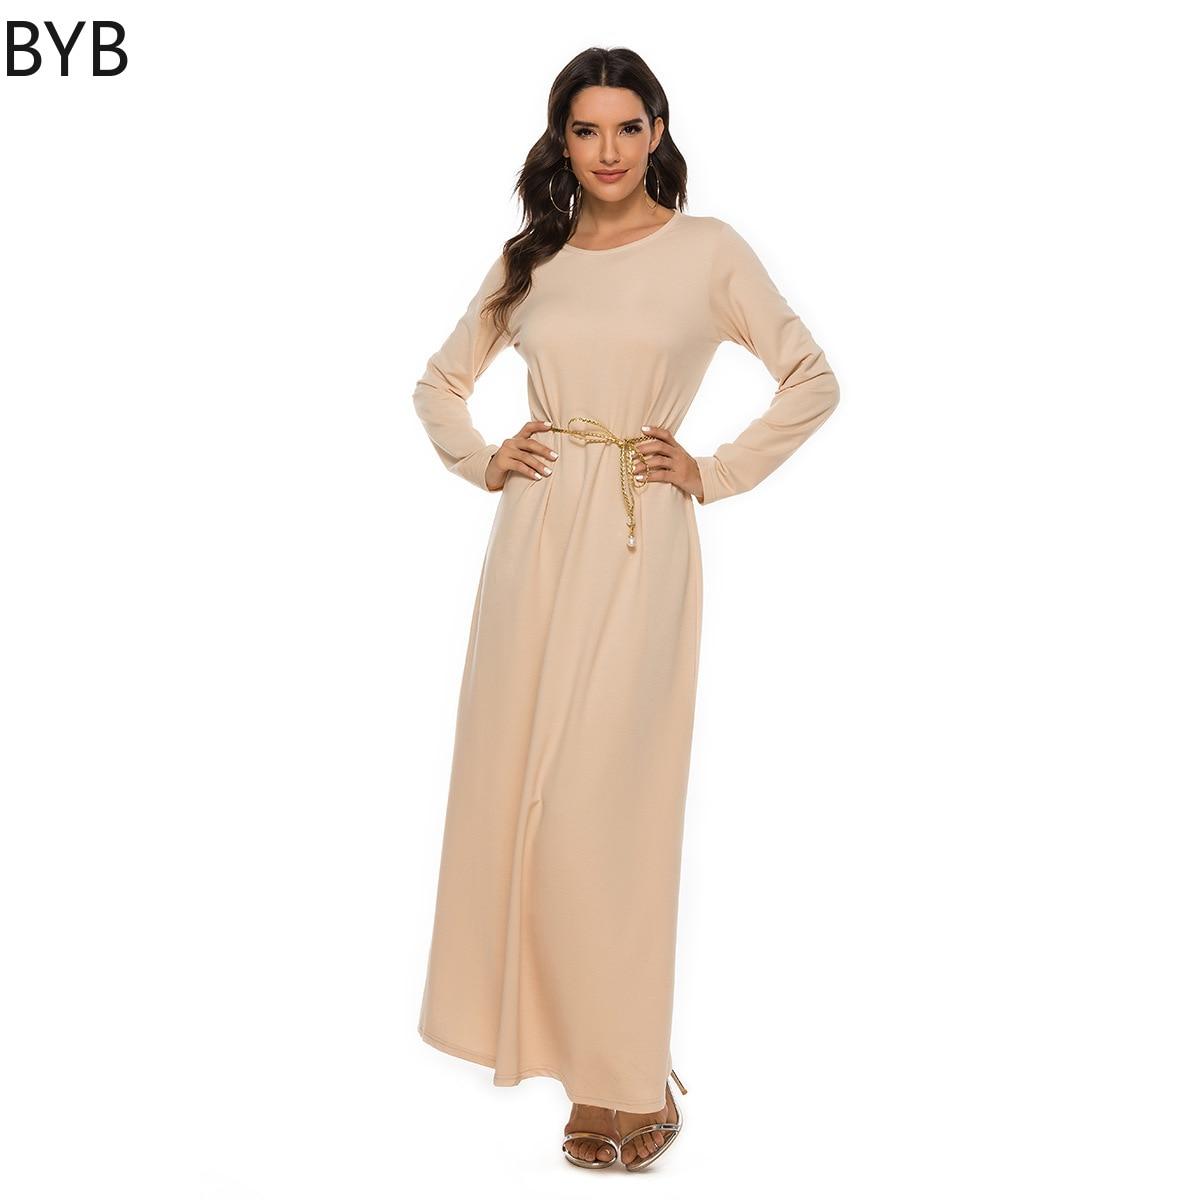 Vestido de talla grande árabe Abaya Dubai Hijab musulmán moda Pakistan turco vestidos marroquí Kaftan islámico ropa Turquía